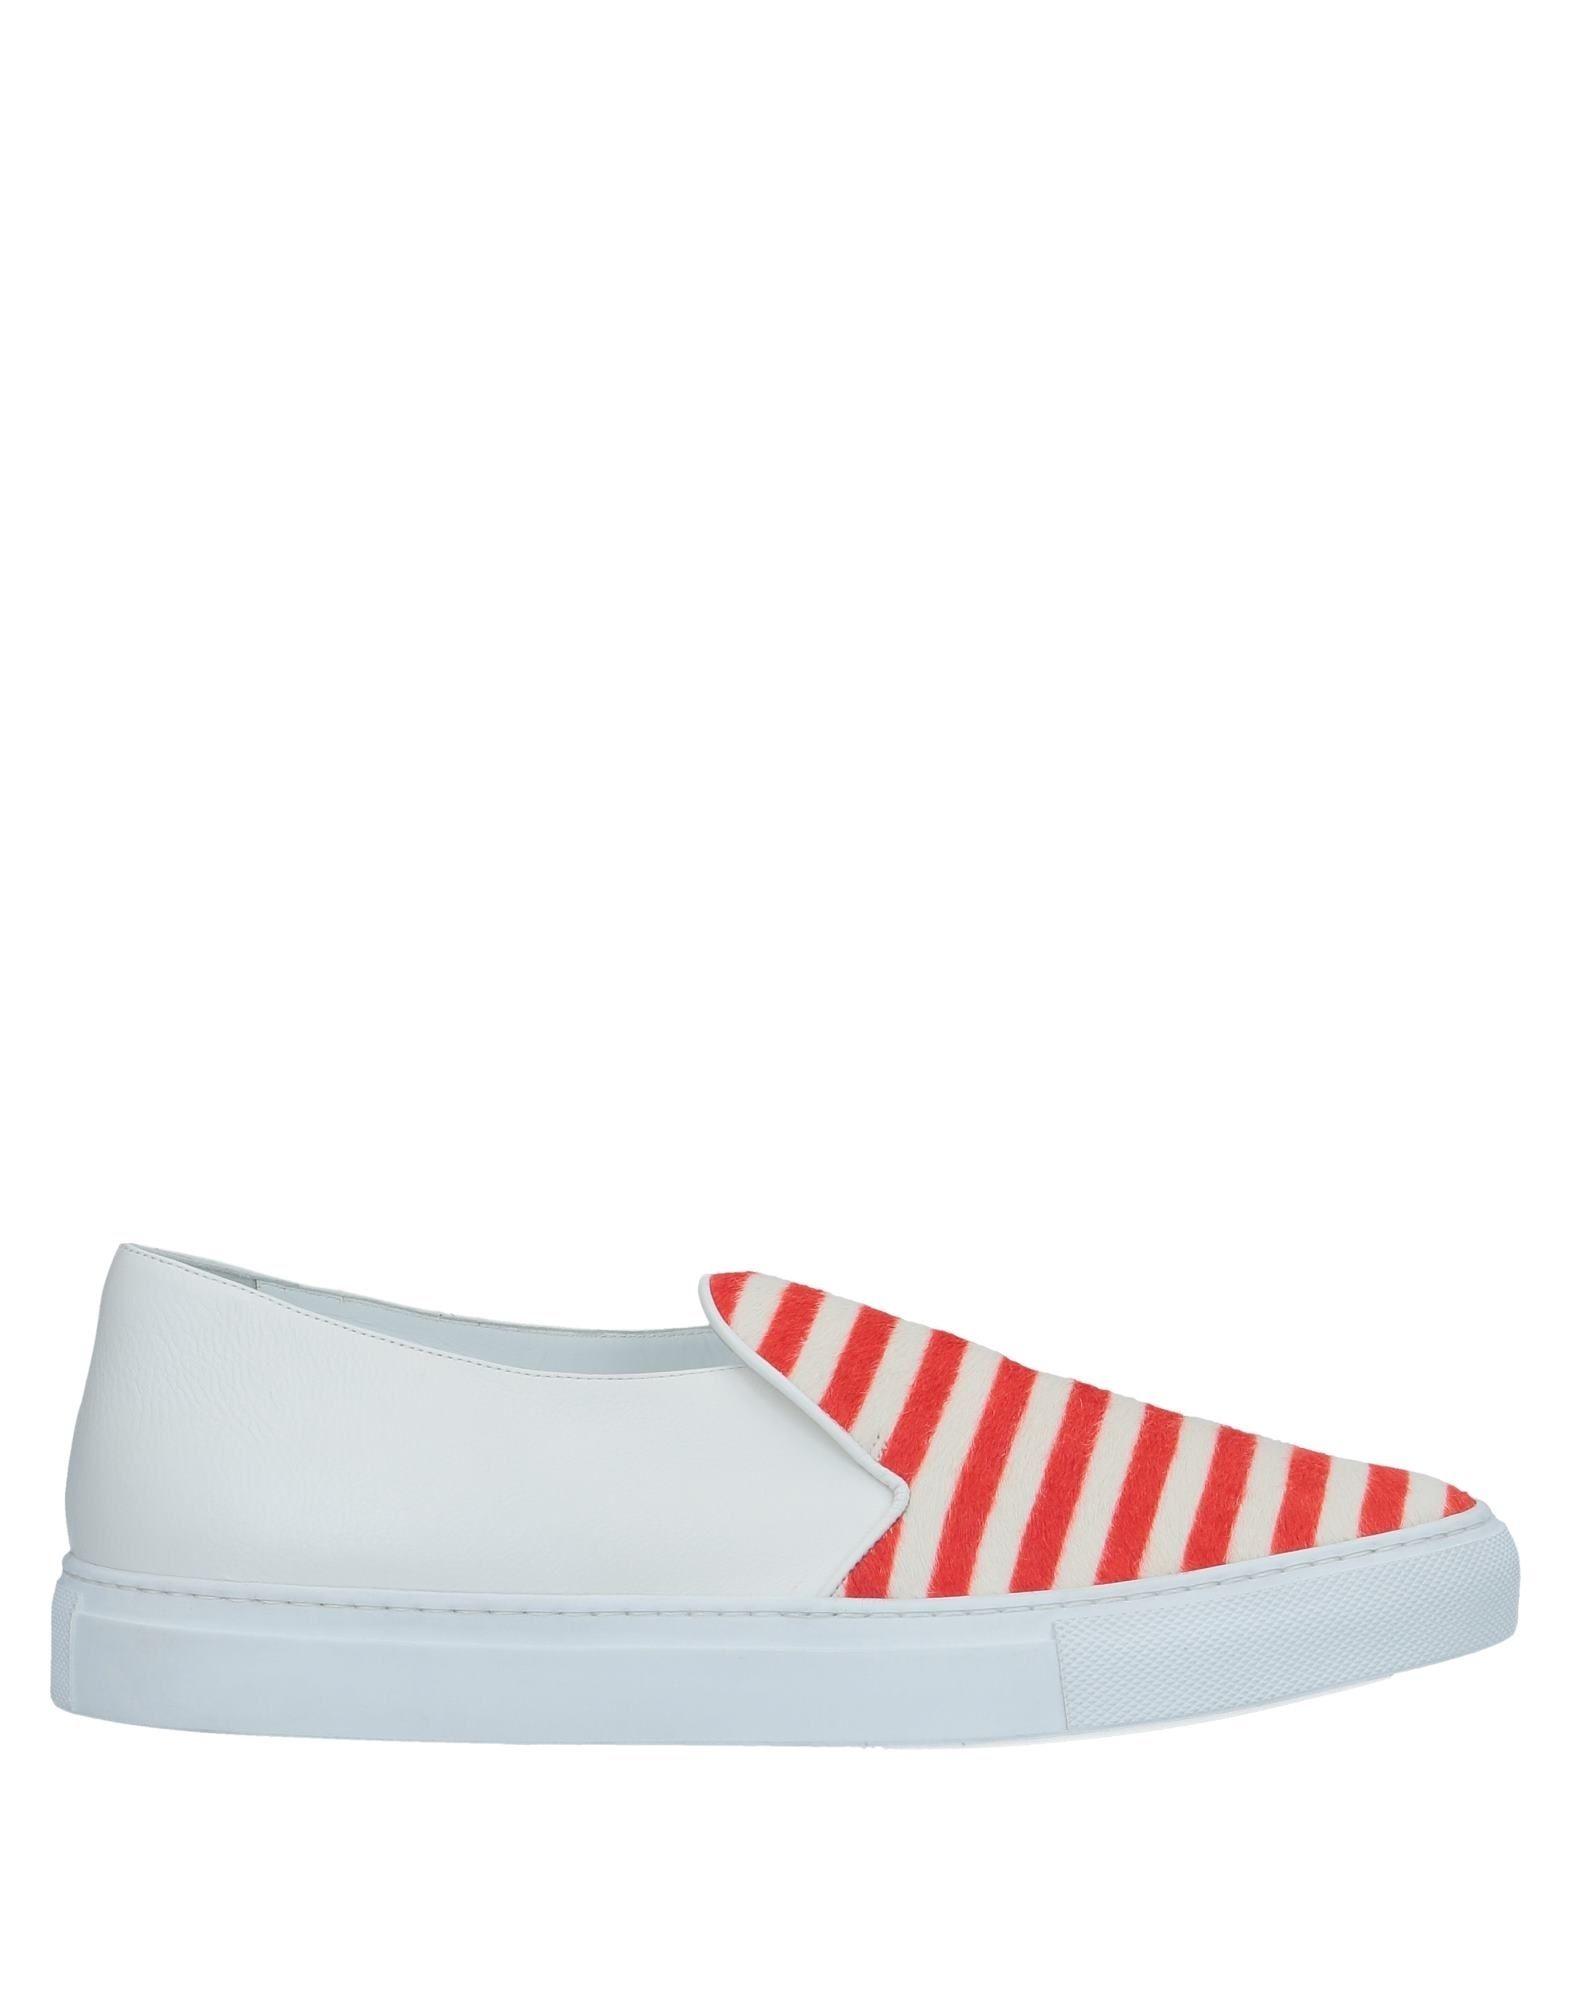 Rodo Sneakers Damen  11507646FLGut aussehende strapazierfähige Schuhe